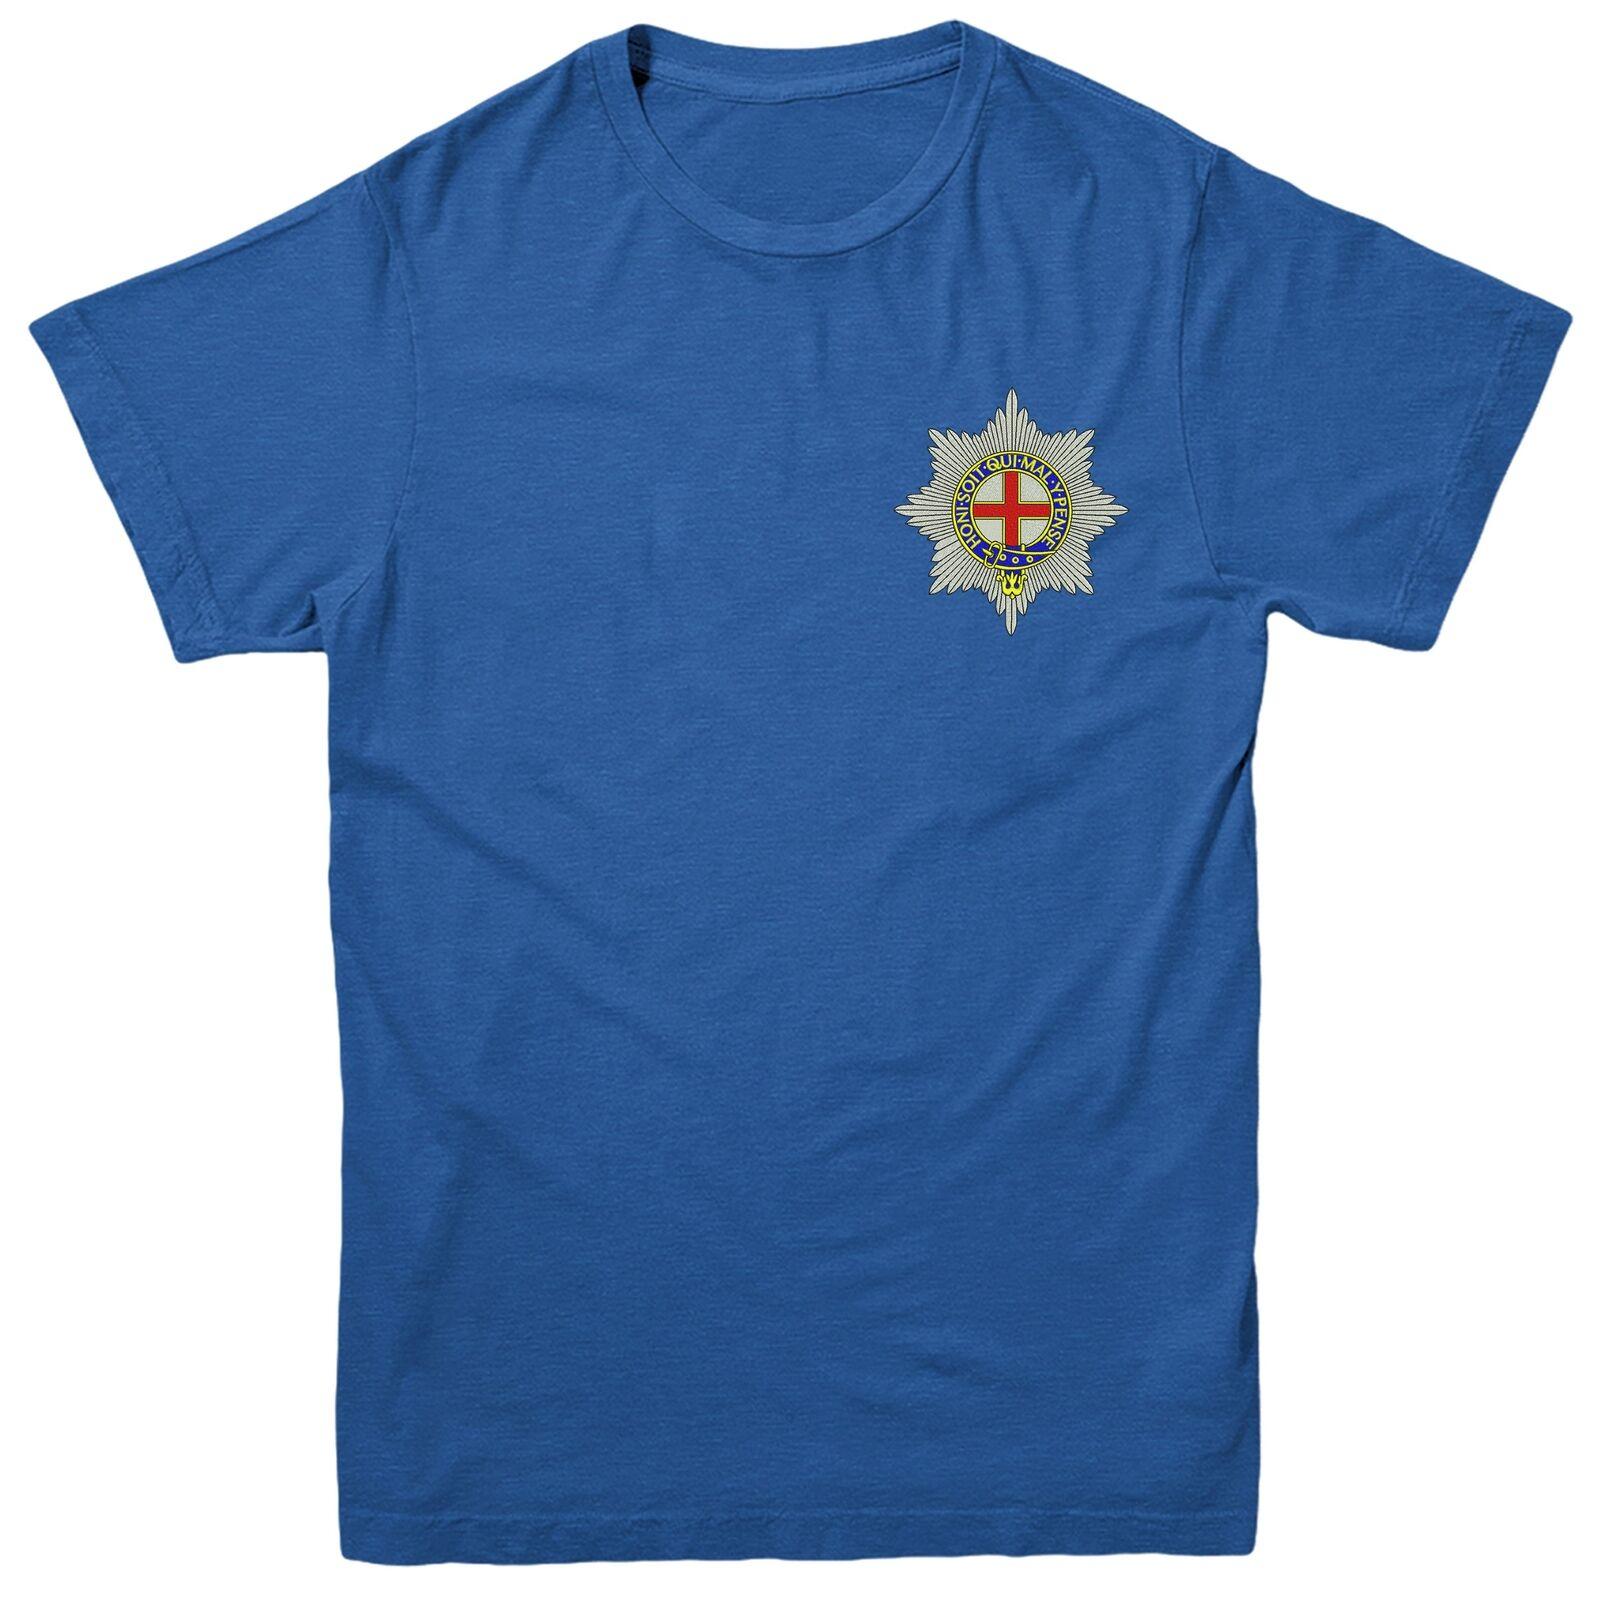 Long or Short Sleeve Smart Shirt Coldstream Guards